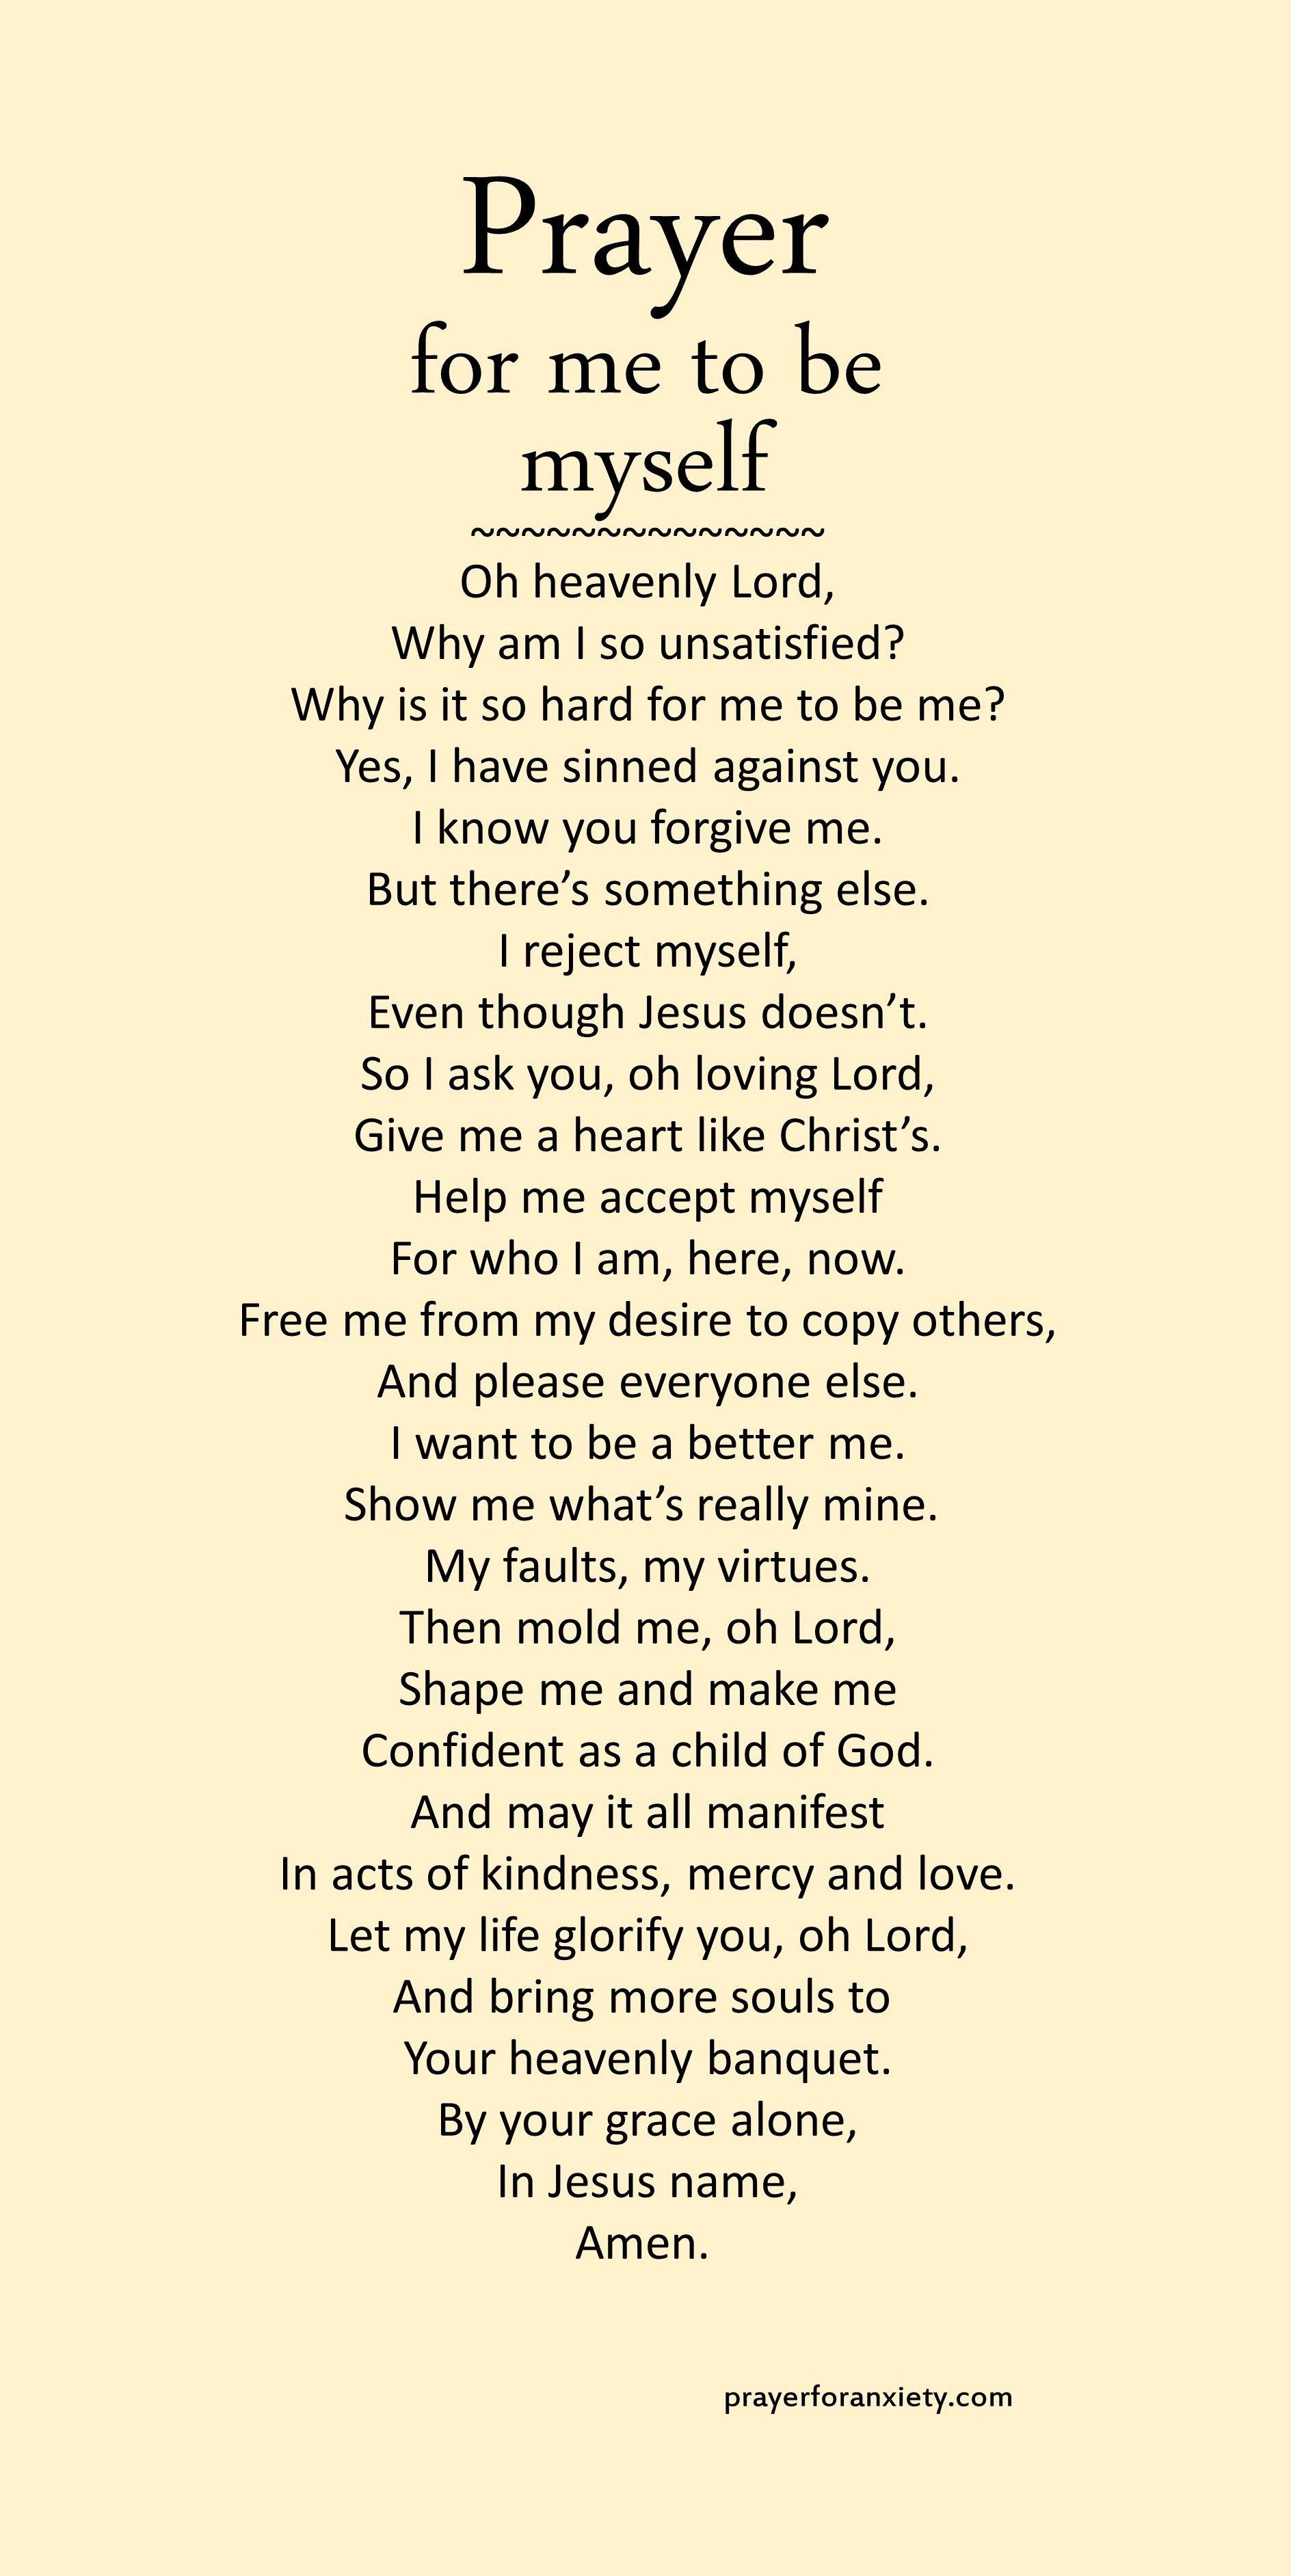 Prayer for me to be myself